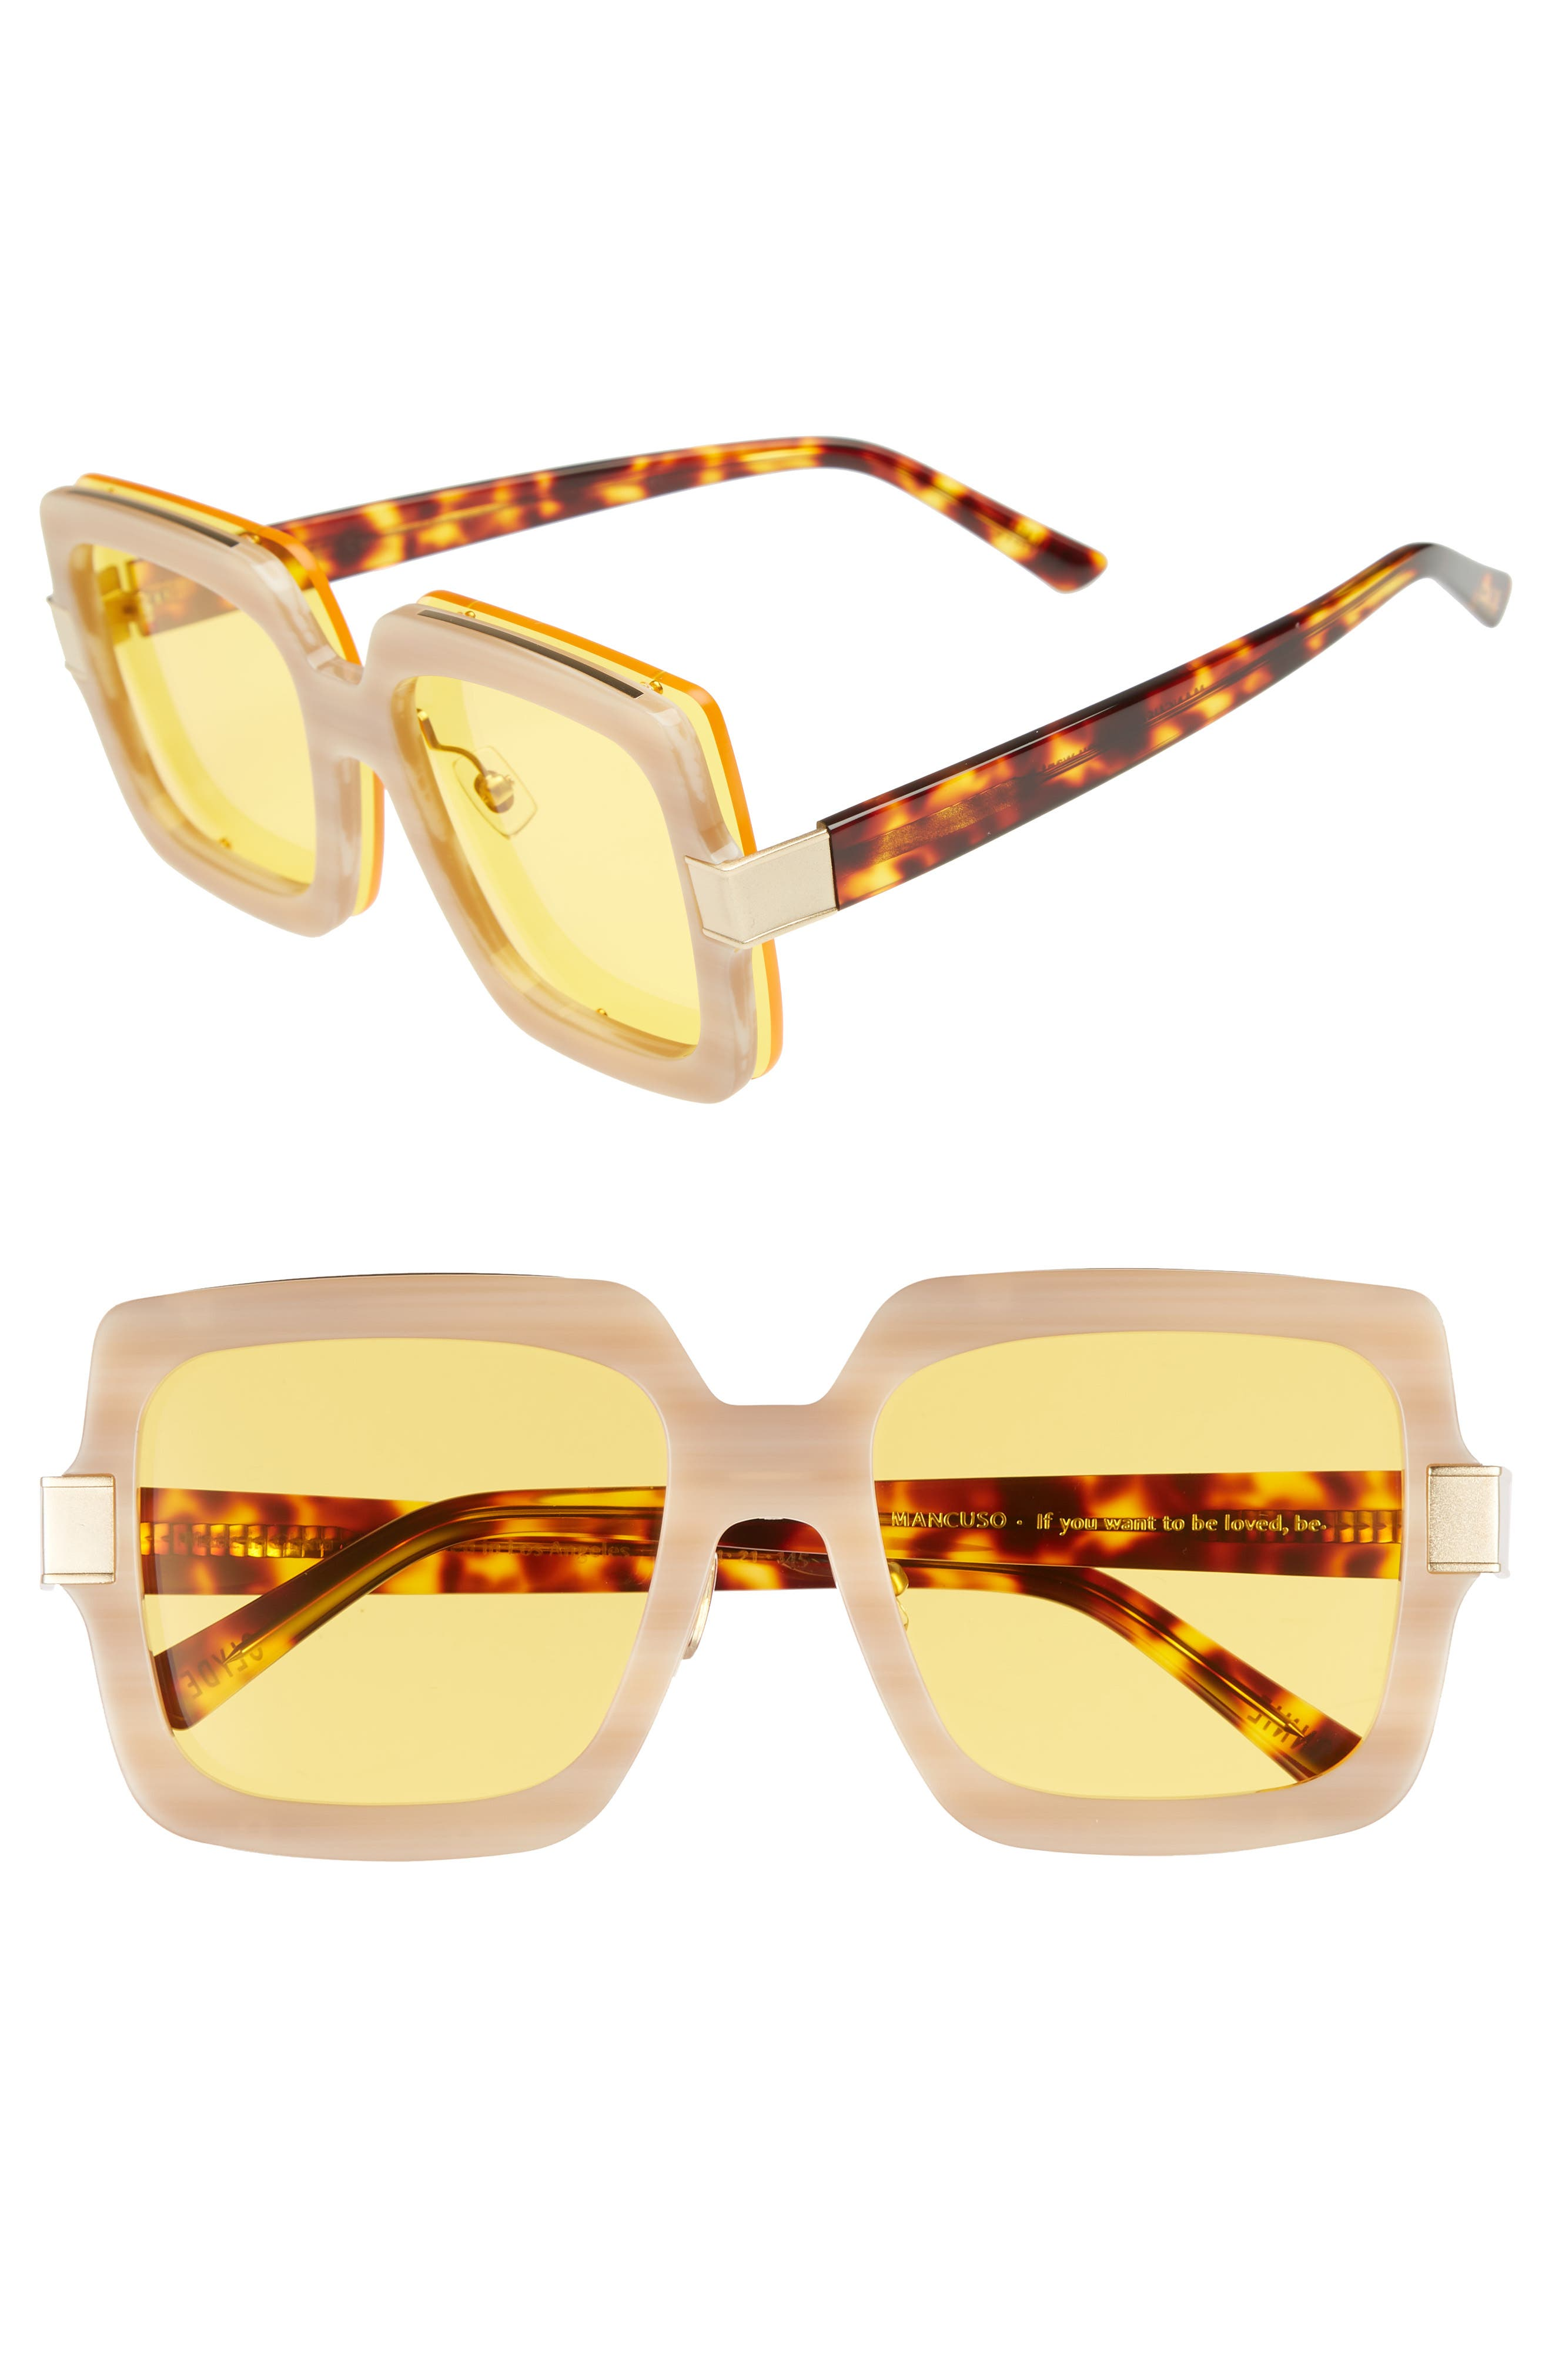 Mancuso 54mm Sunglasses,                             Main thumbnail 1, color,                             Red Elm/ Yellow